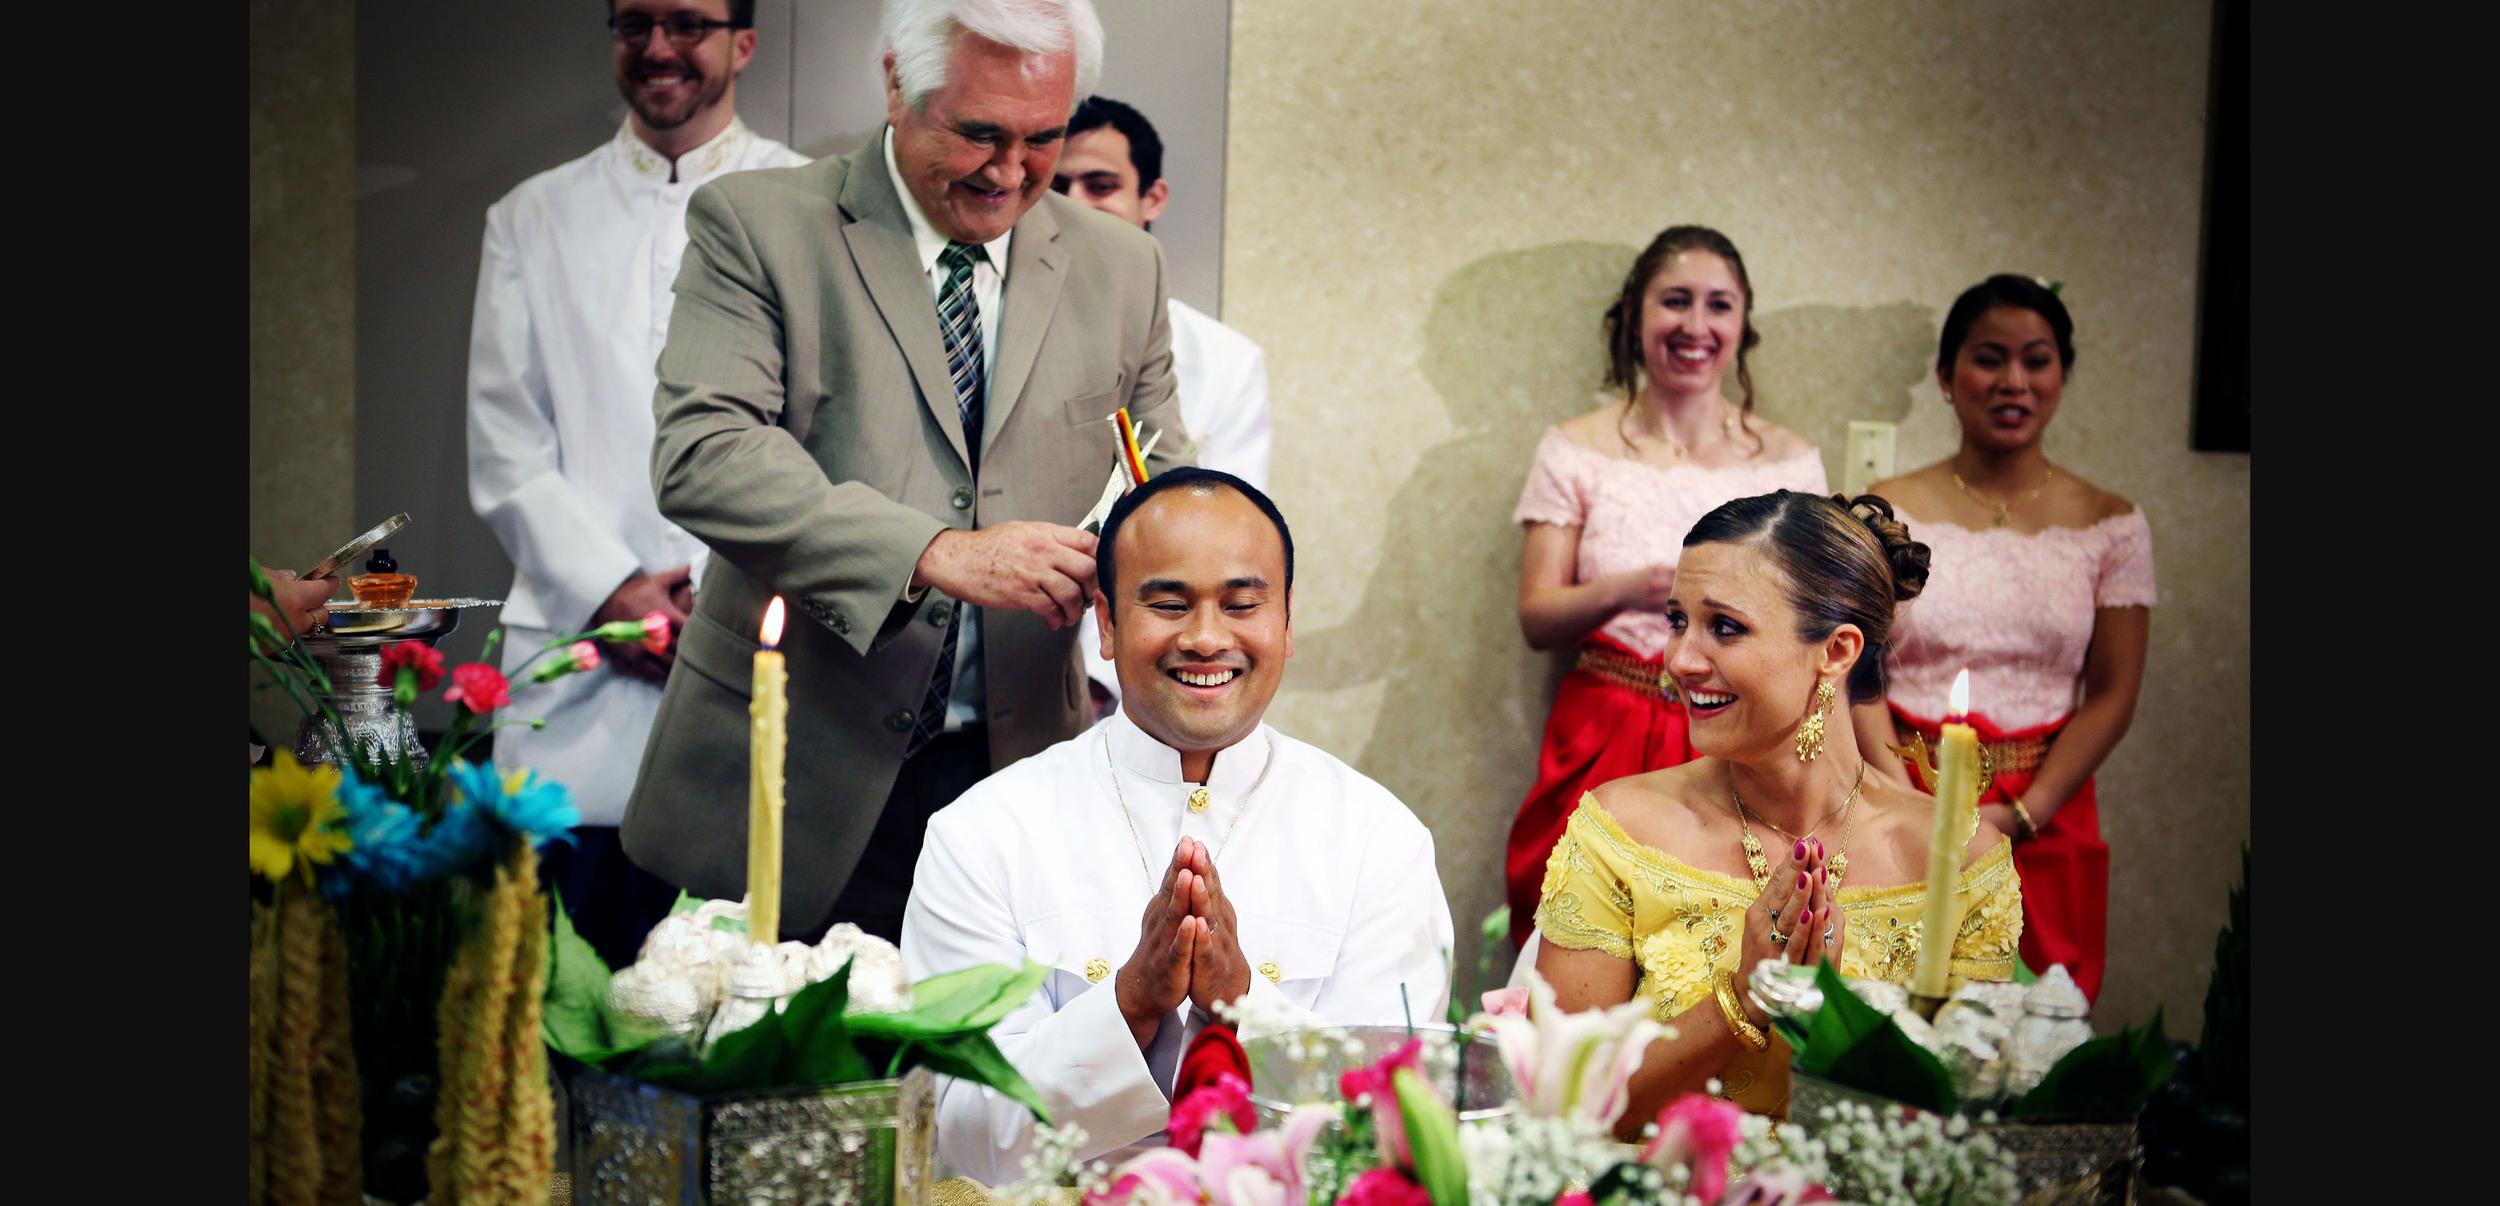 *Mak and Kina Wedding 1-446-1 copy 2.jpg